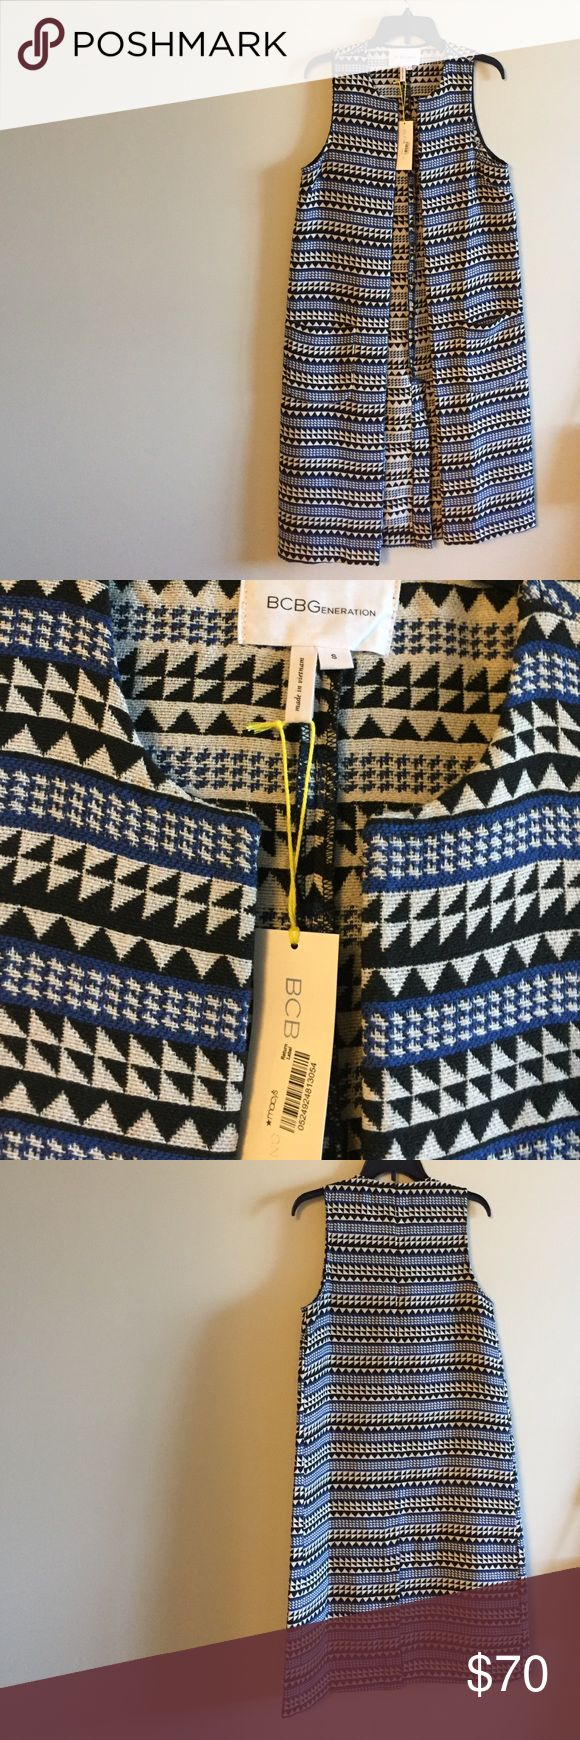 "💕HP💕 Aztec BCBGeneration Vest Aztec BCBGeneration Vest 42"" Length 59% Polyester 34% Cotton 2%Nylon Pockets each side  Perfect for the fall NWT BCBGeneration Jackets & Coats Vests"